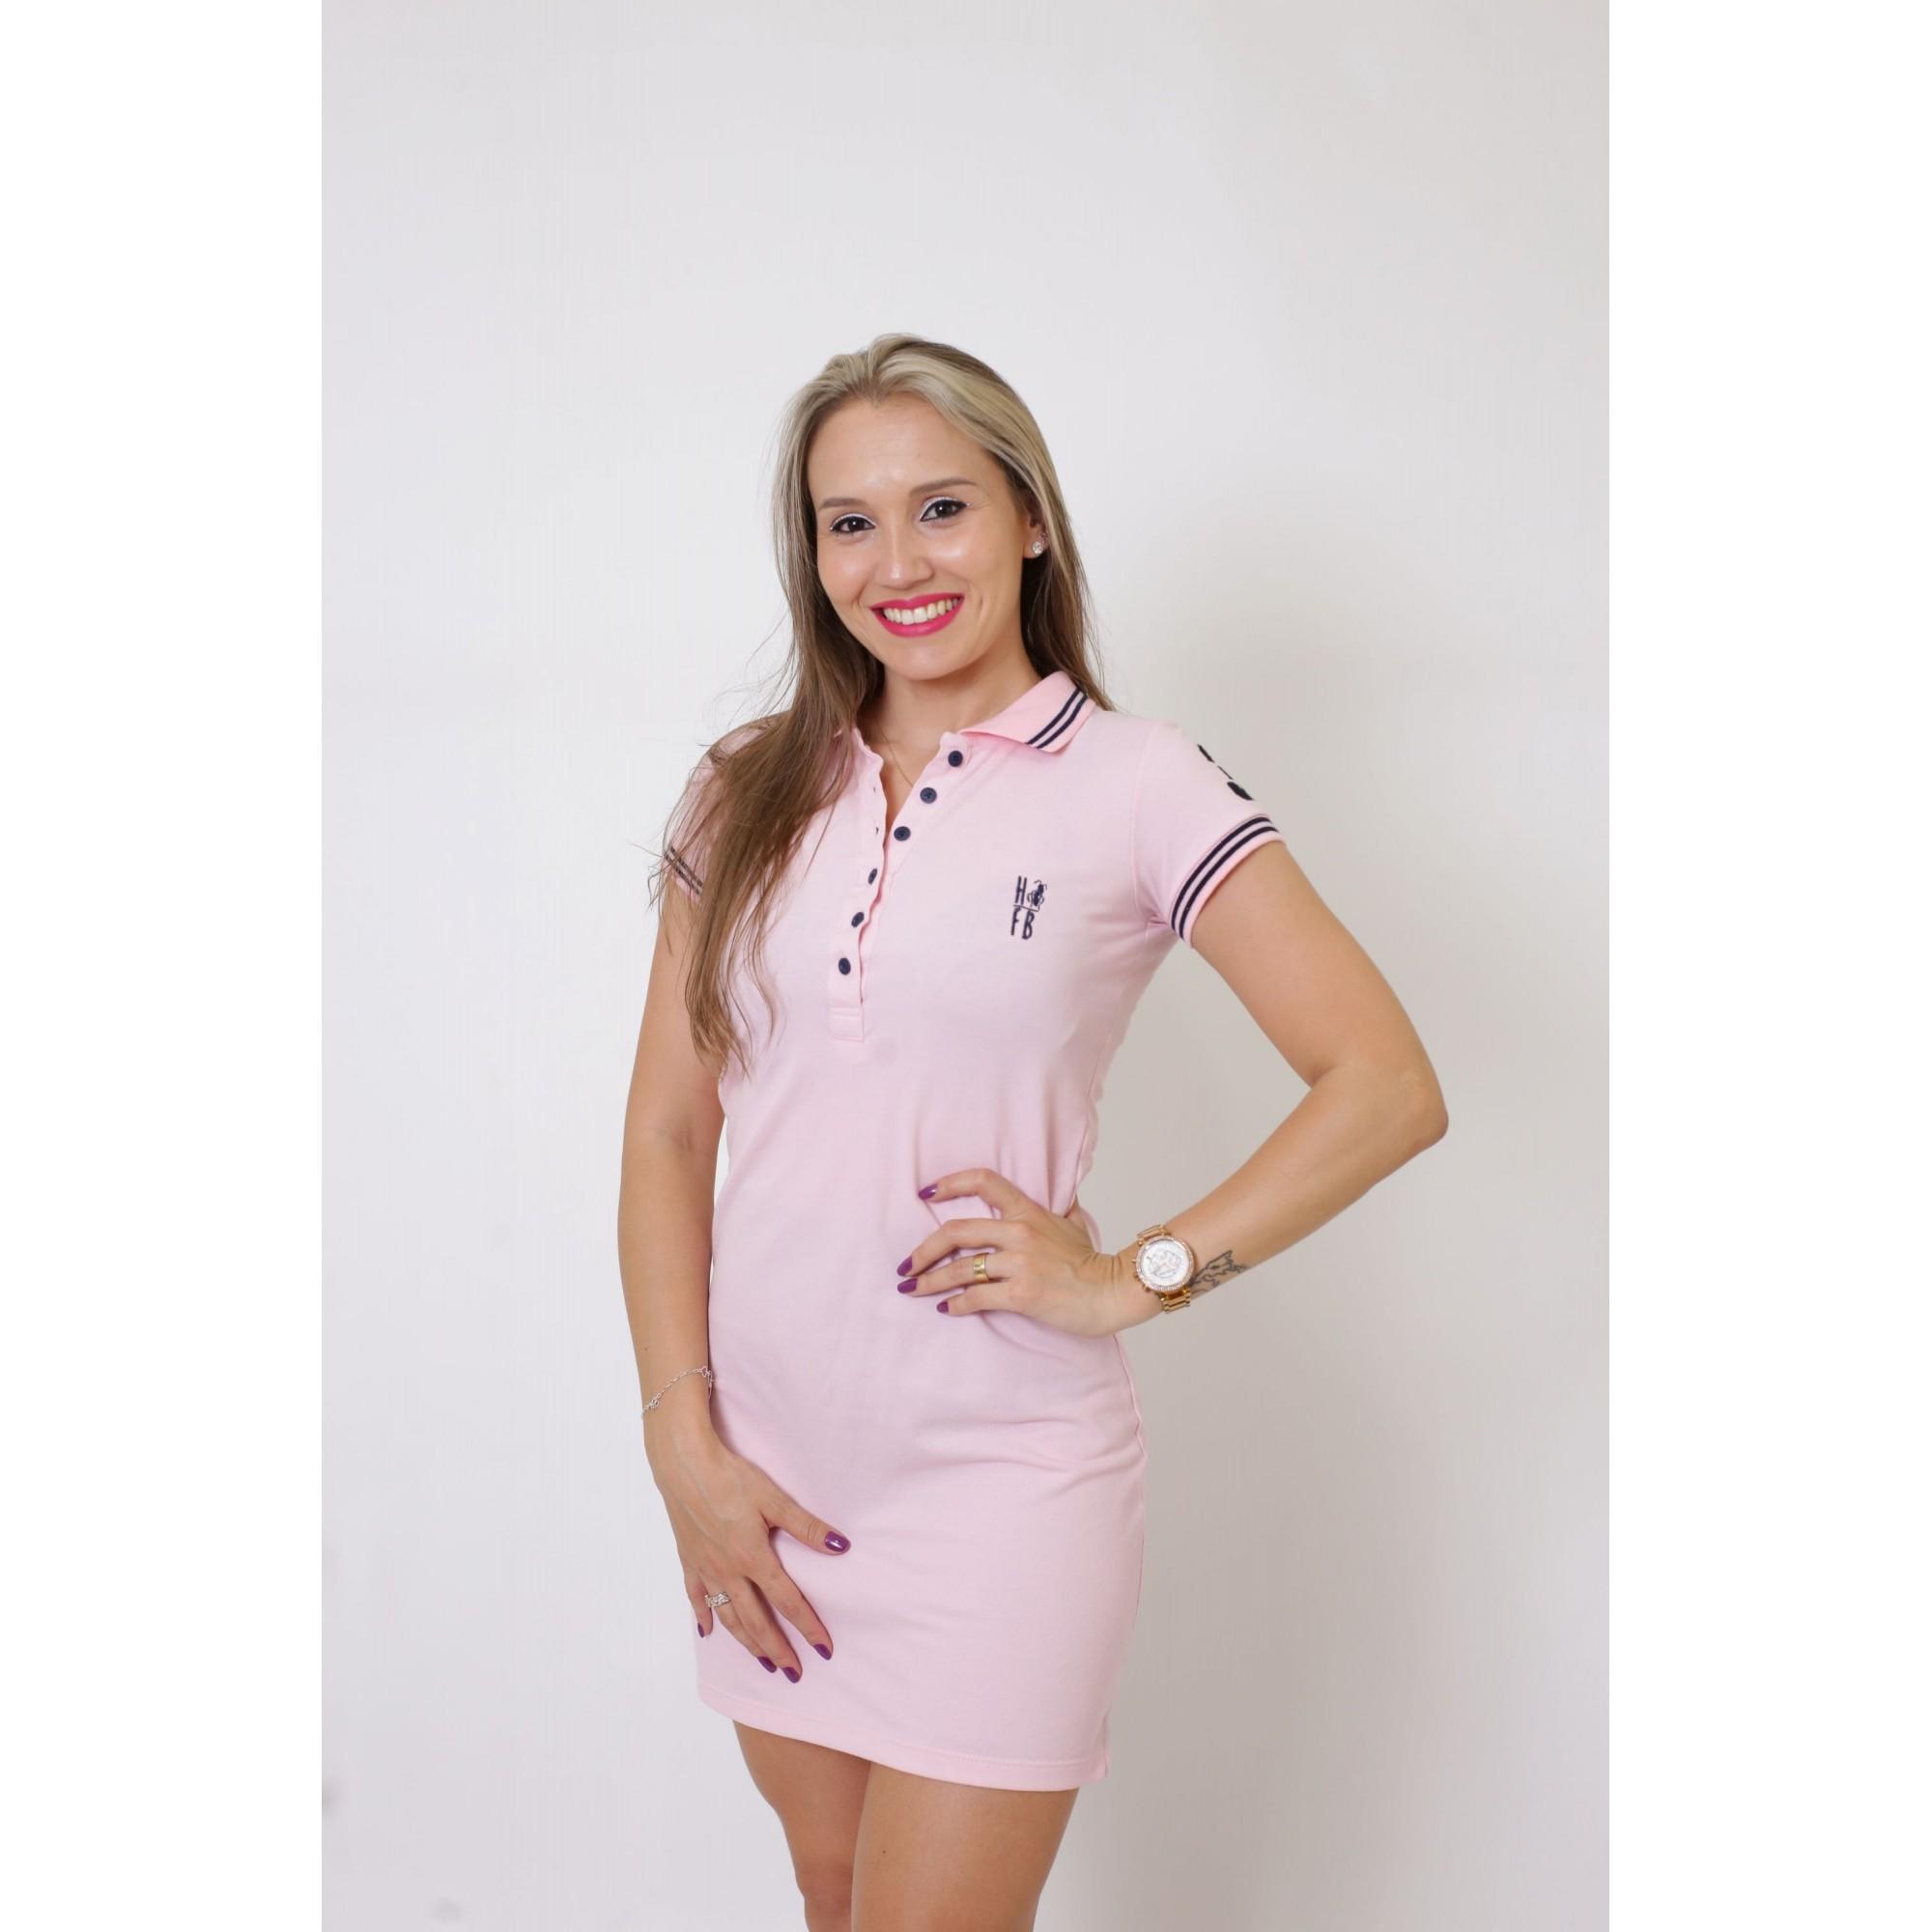 MÃE E FILHA > Kit 02 Vestidos Polo Rosa Amor [Coleção Tal Mãe Tal Filha]  - Heitor Fashion Brazil